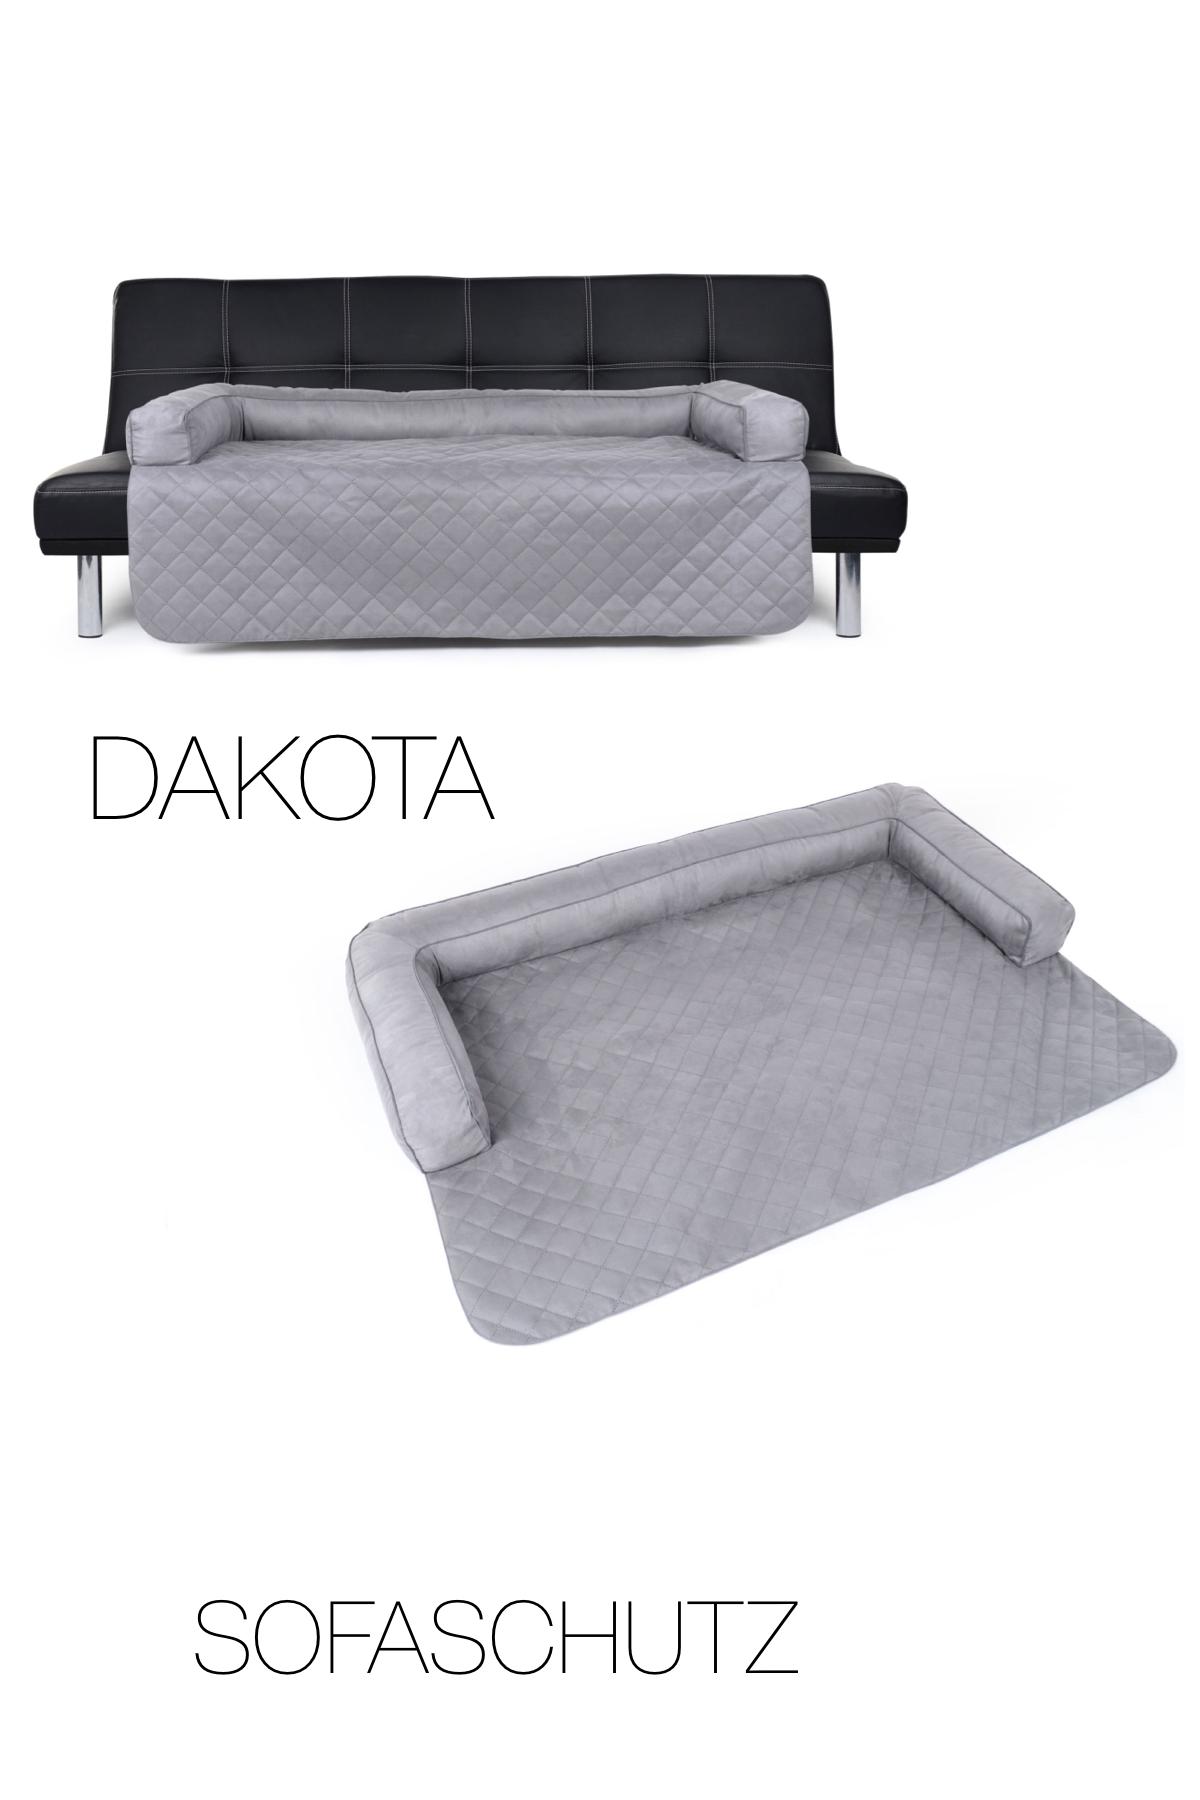 Hunde Sofaschutz Decke Dakota Softline 100x100 Cm Grau Sofaschutz Hundekissen Hunde Couch